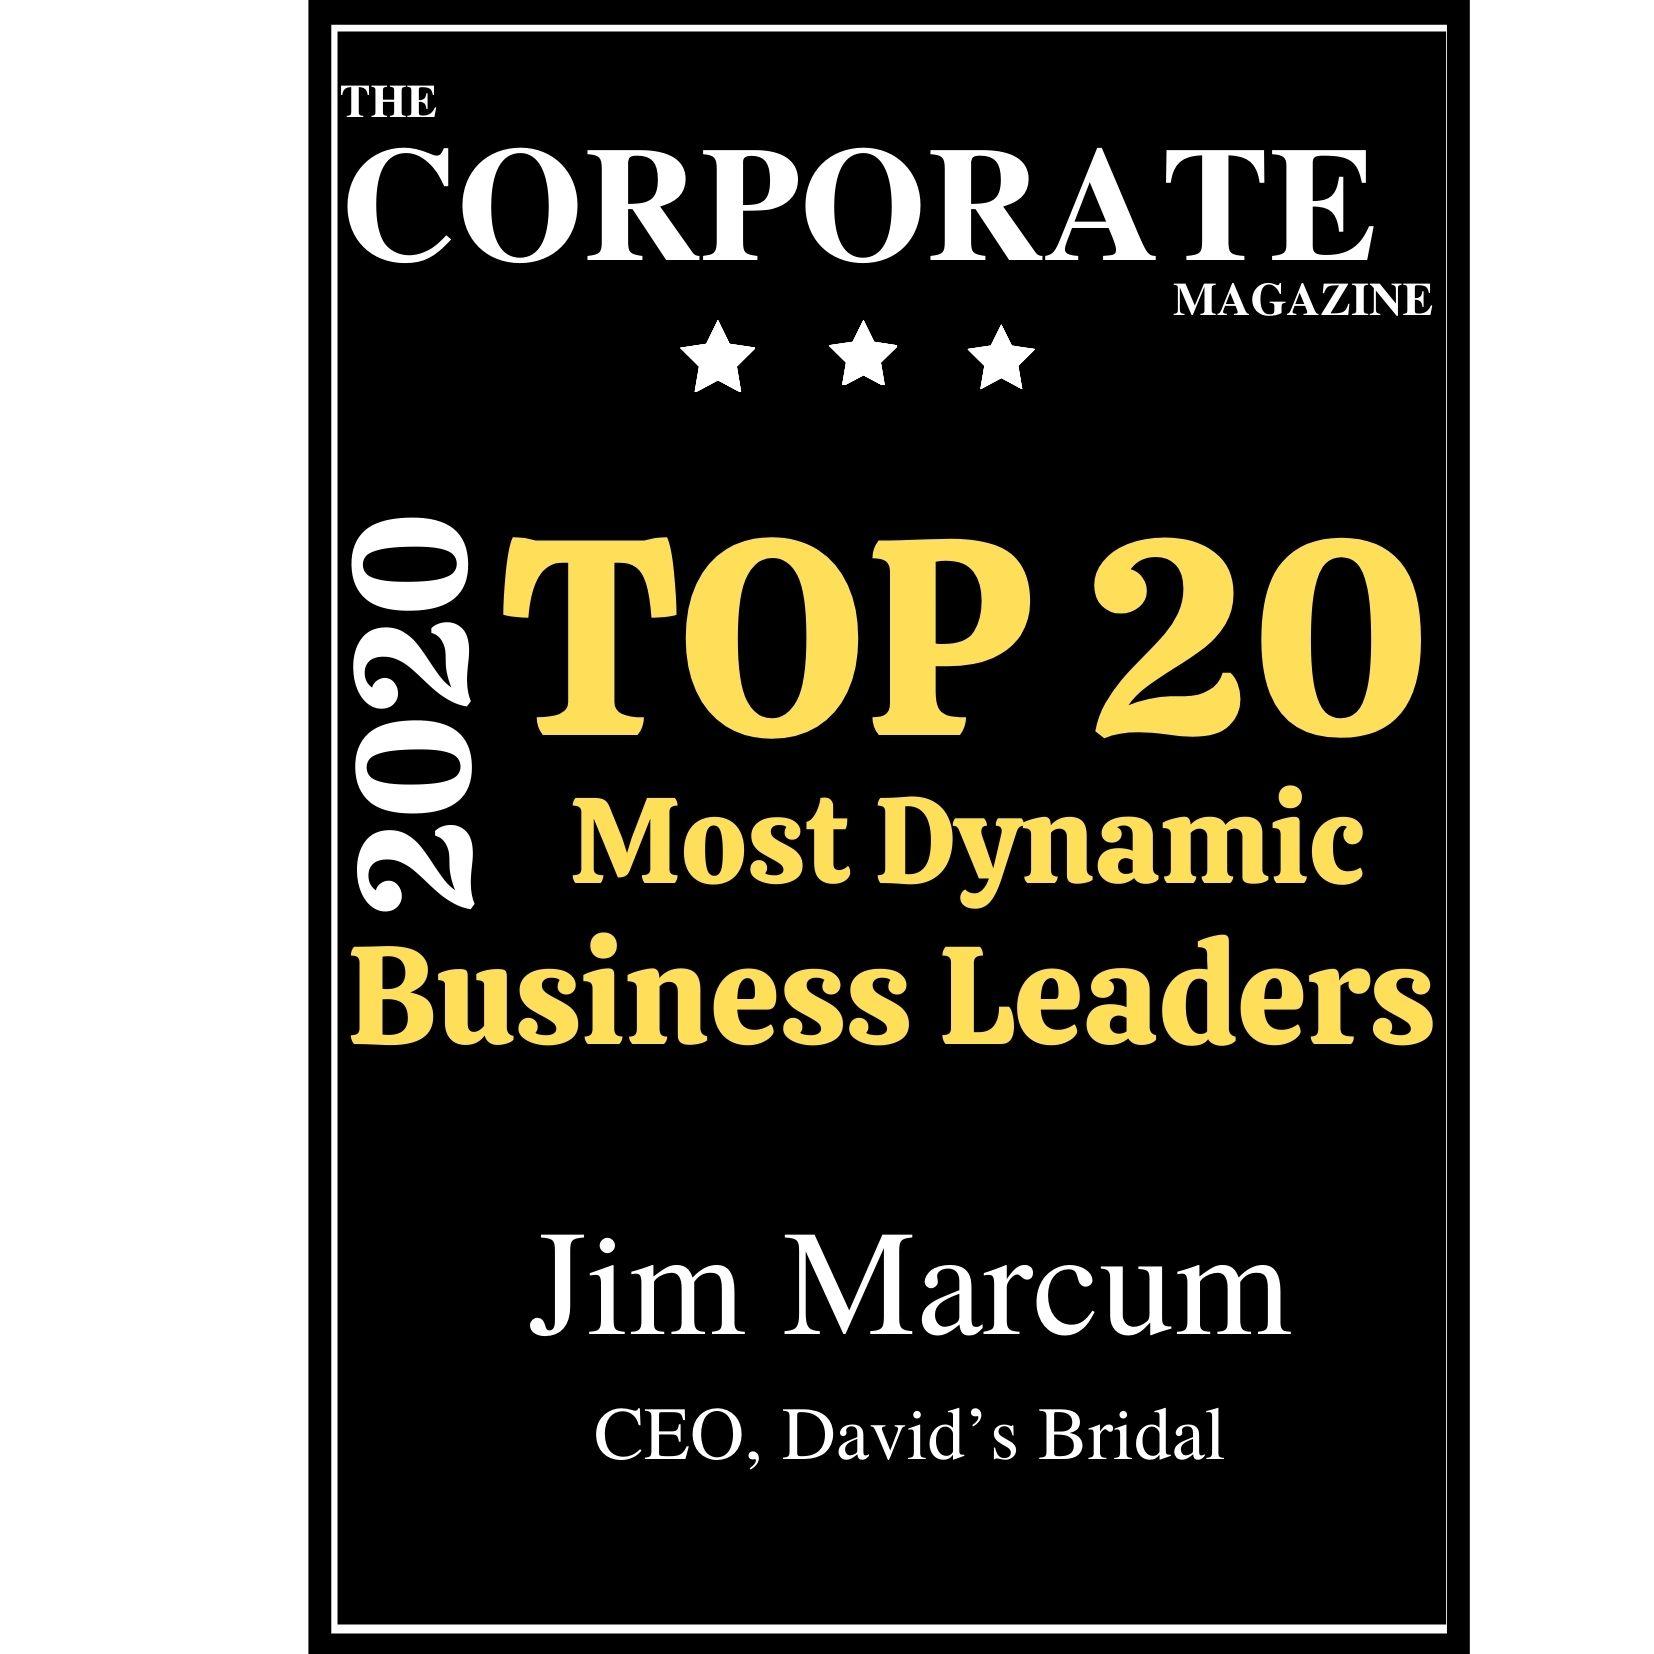 Jim Marcum Business Leaders